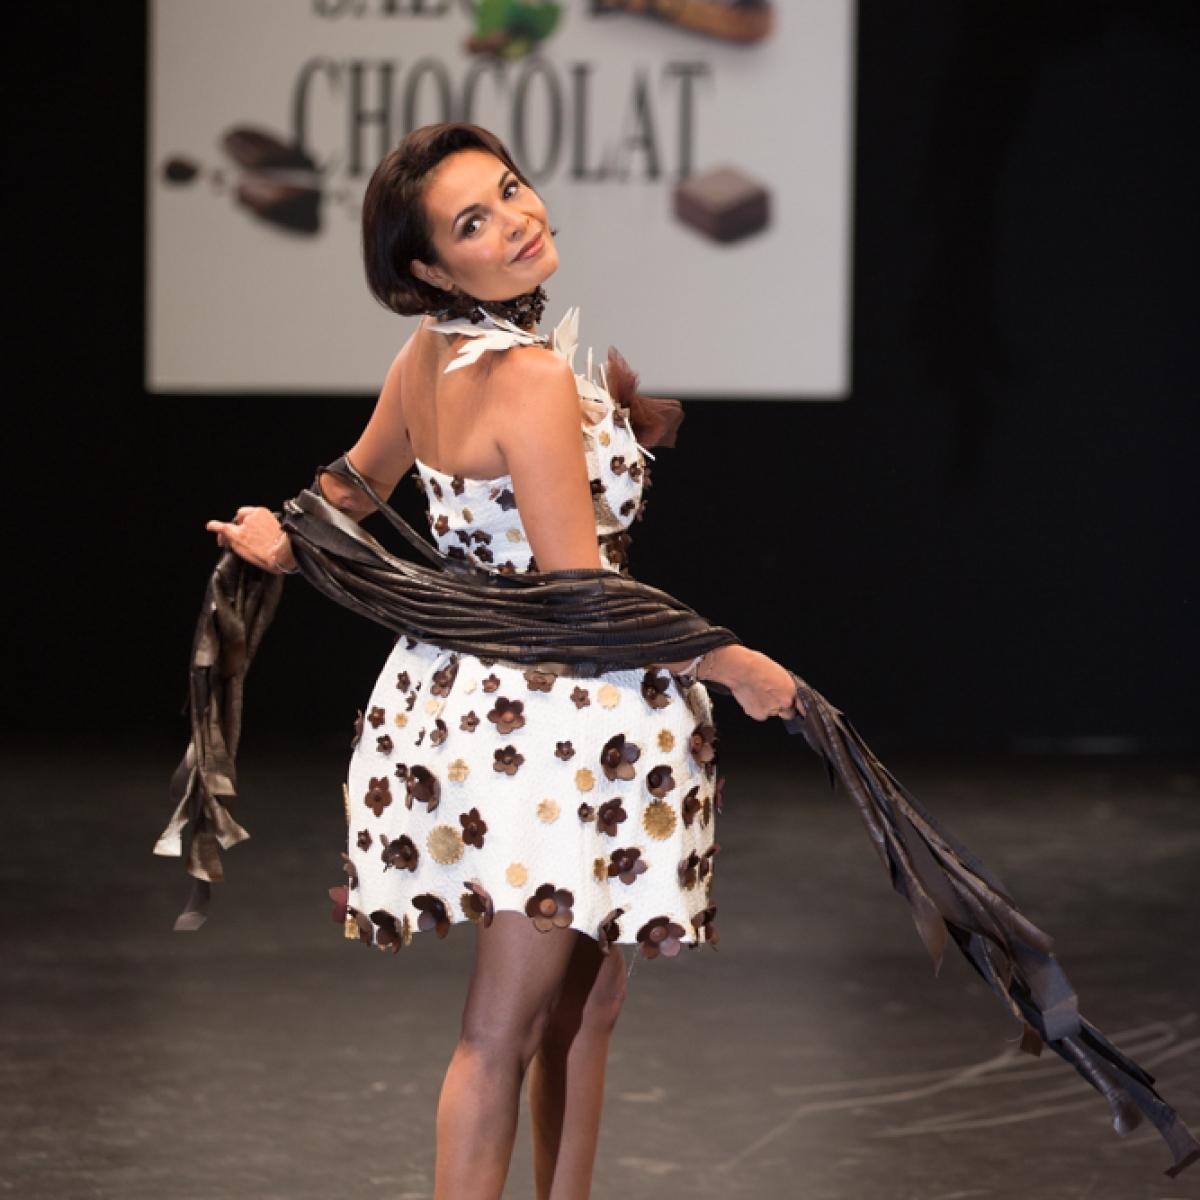 Saïda Jawad du salon du chocolat marwan moussa